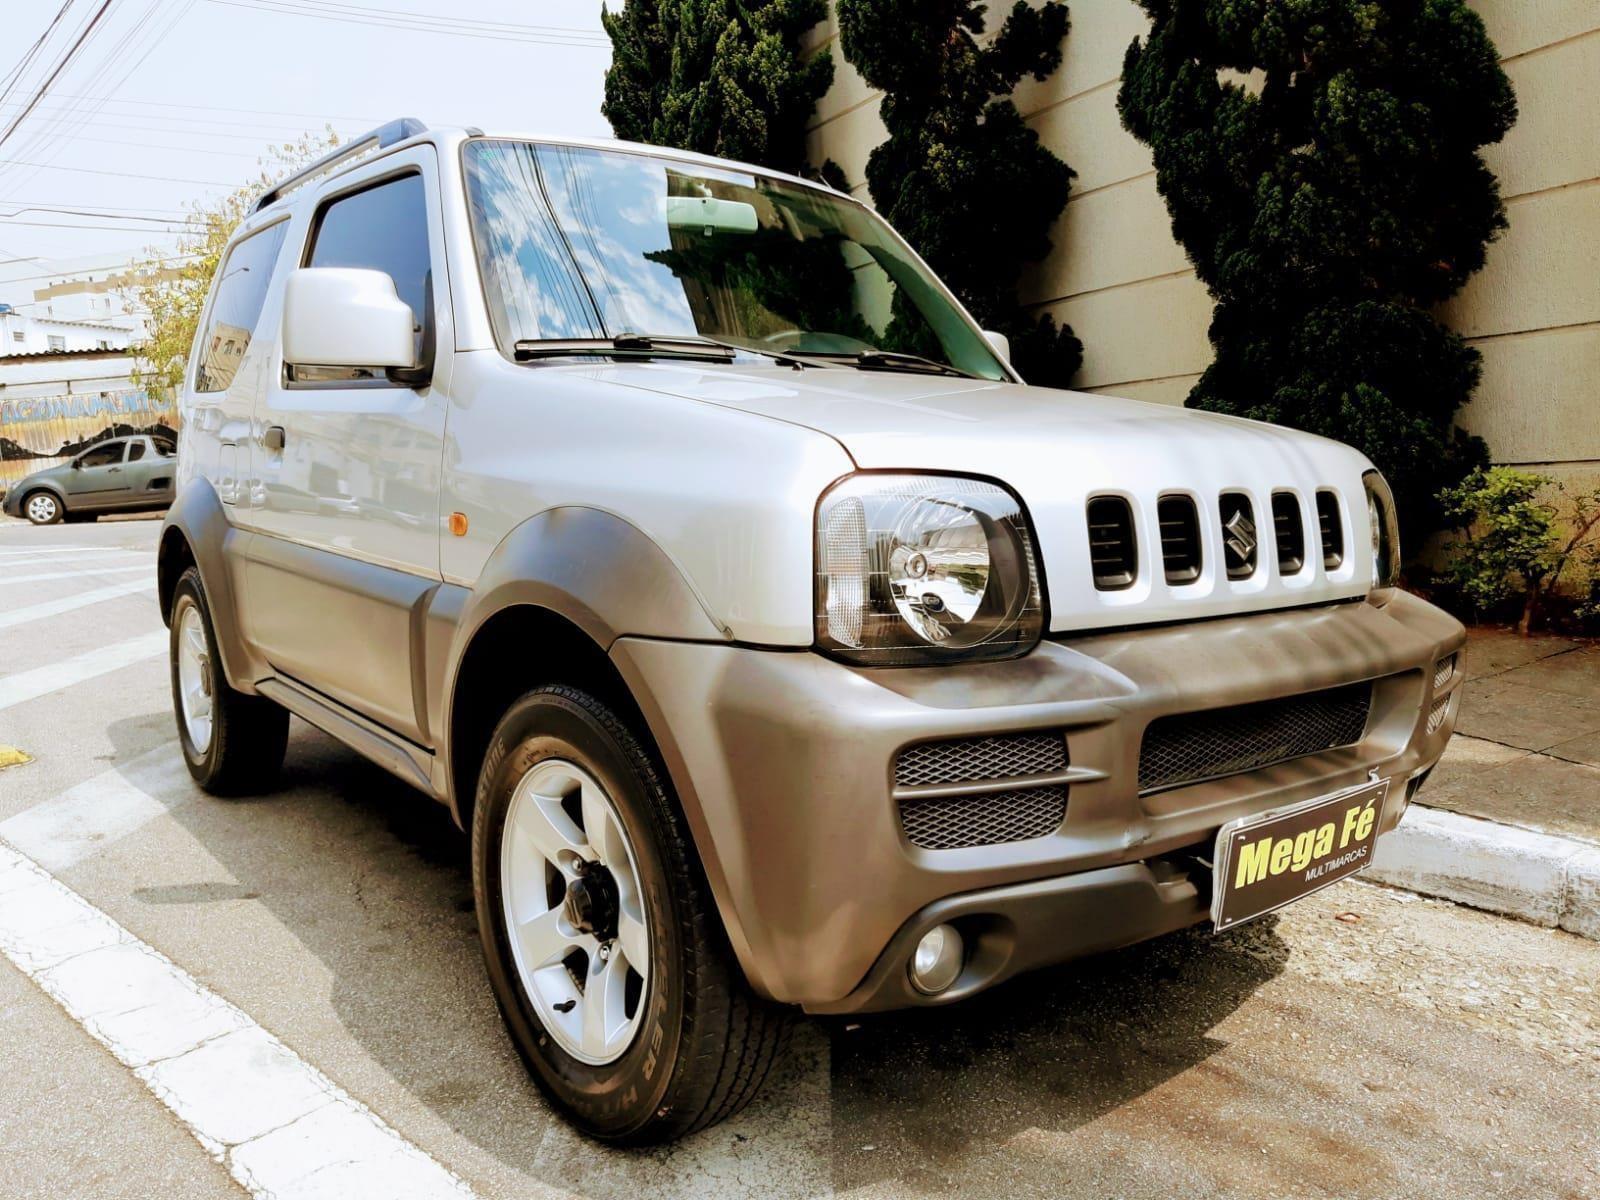 //www.autoline.com.br/carro/suzuki/jimny-13-16v-gasolina-2p-4x4-manual/2012/sao-paulo-sp/15685929